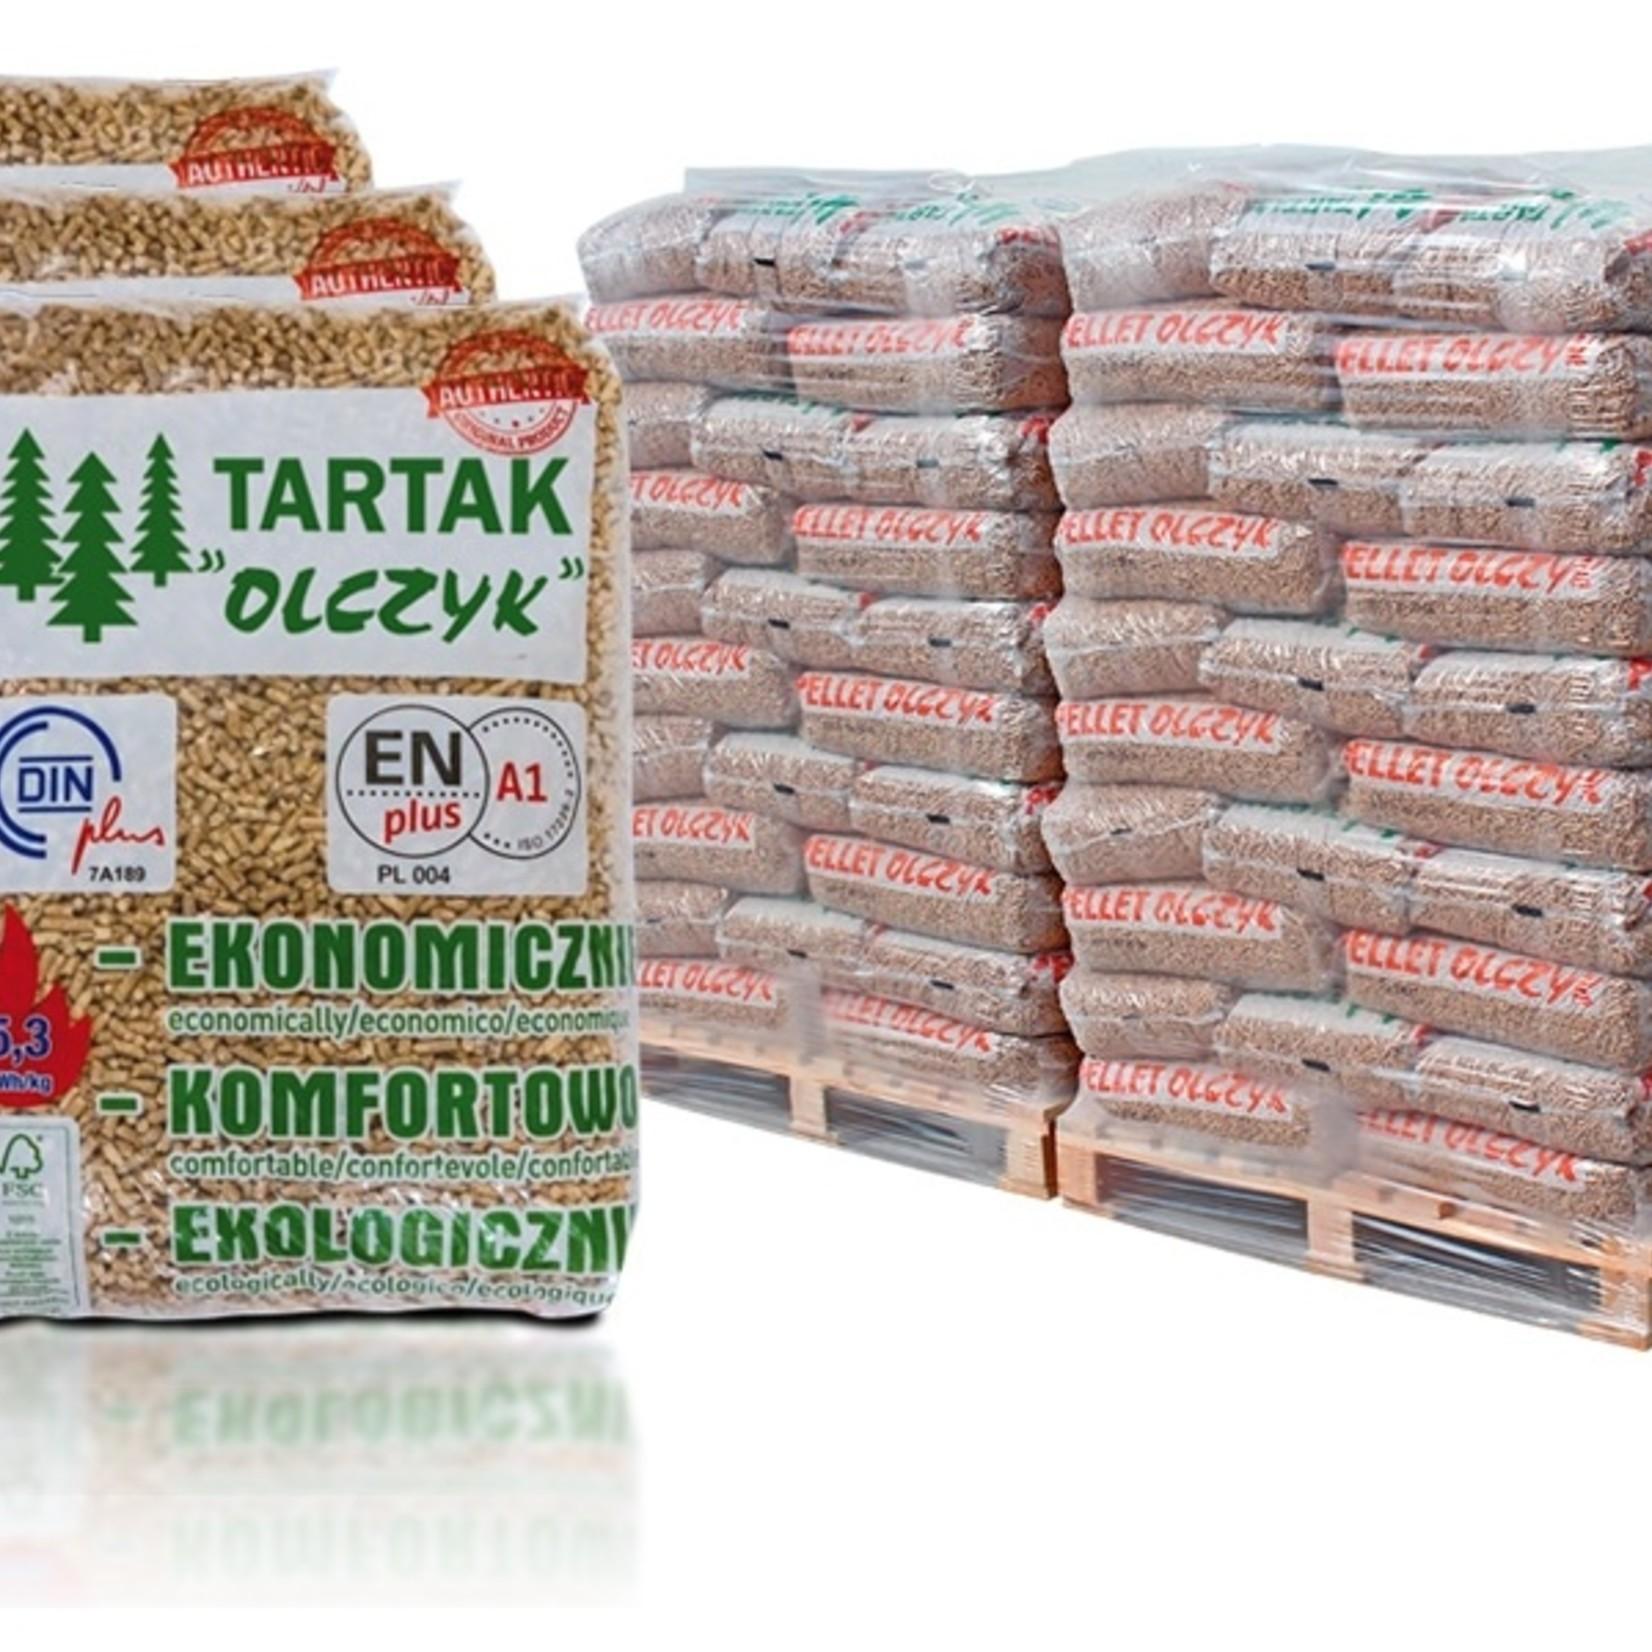 Tartak Tartak 100% naaldhout Pellet EN+ A1 per pallet 480 kg.